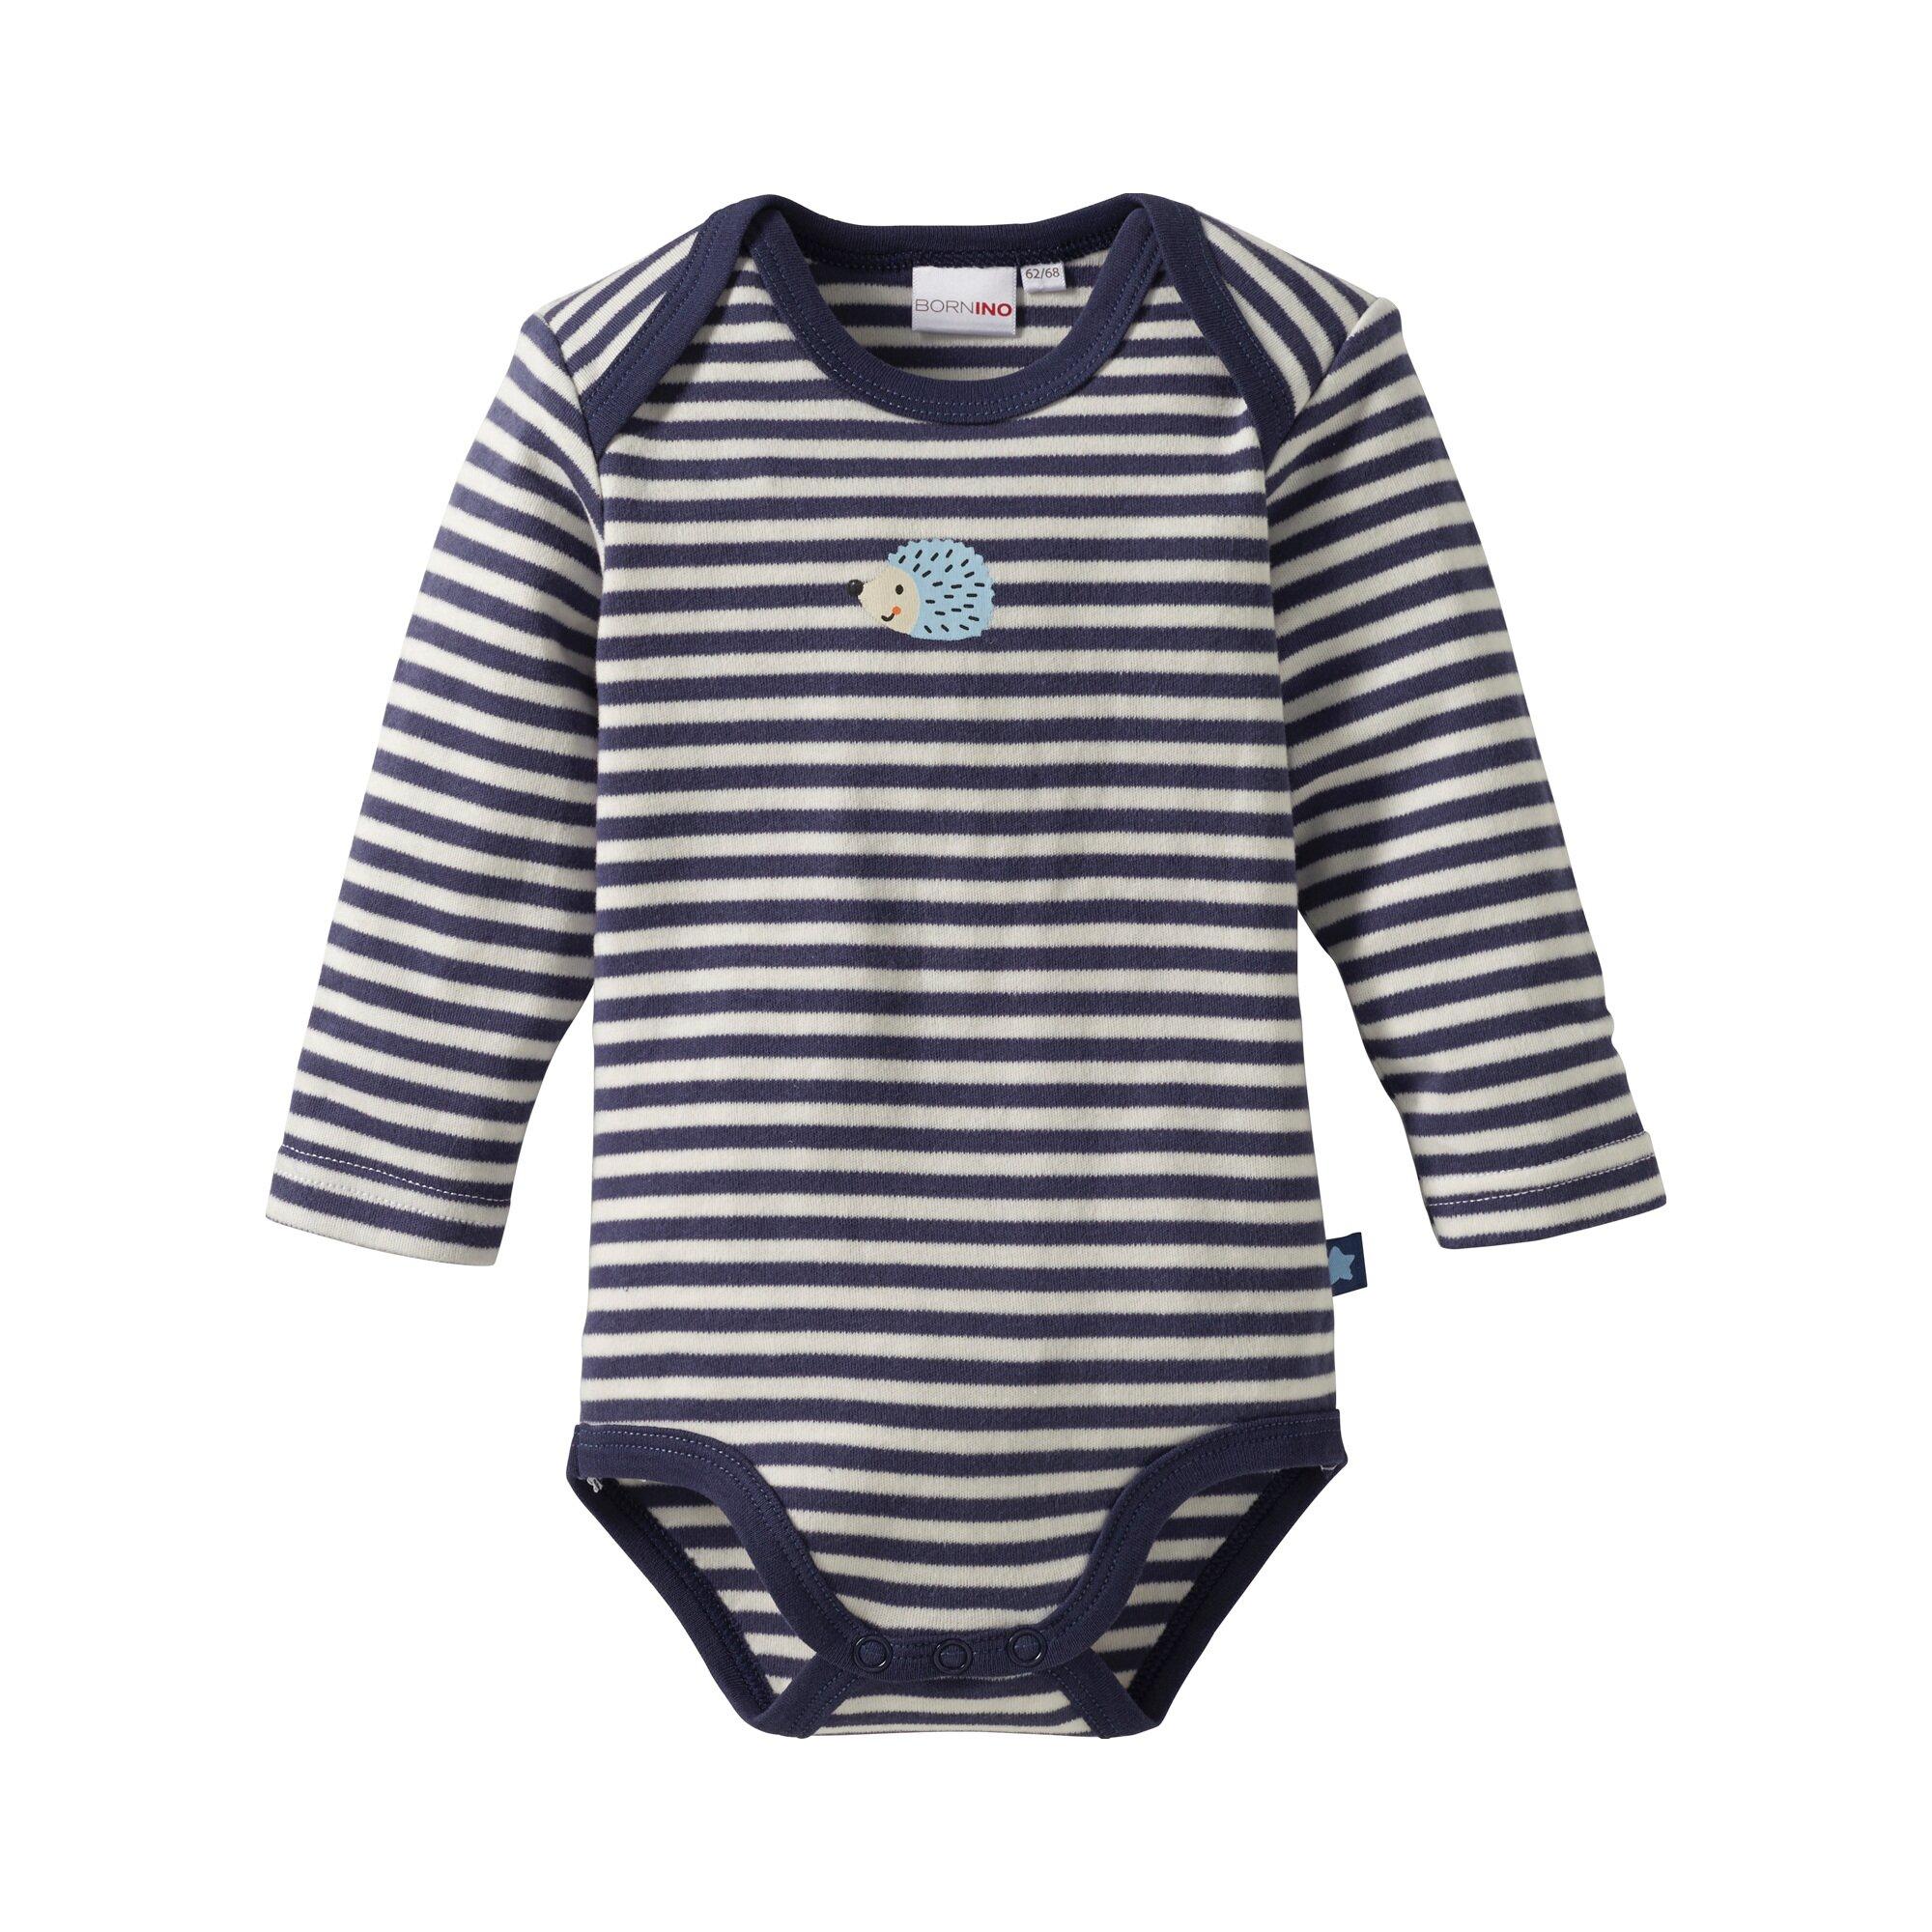 basics-baby-body-langarm-3er-pack-blau-50-62-74-86-98